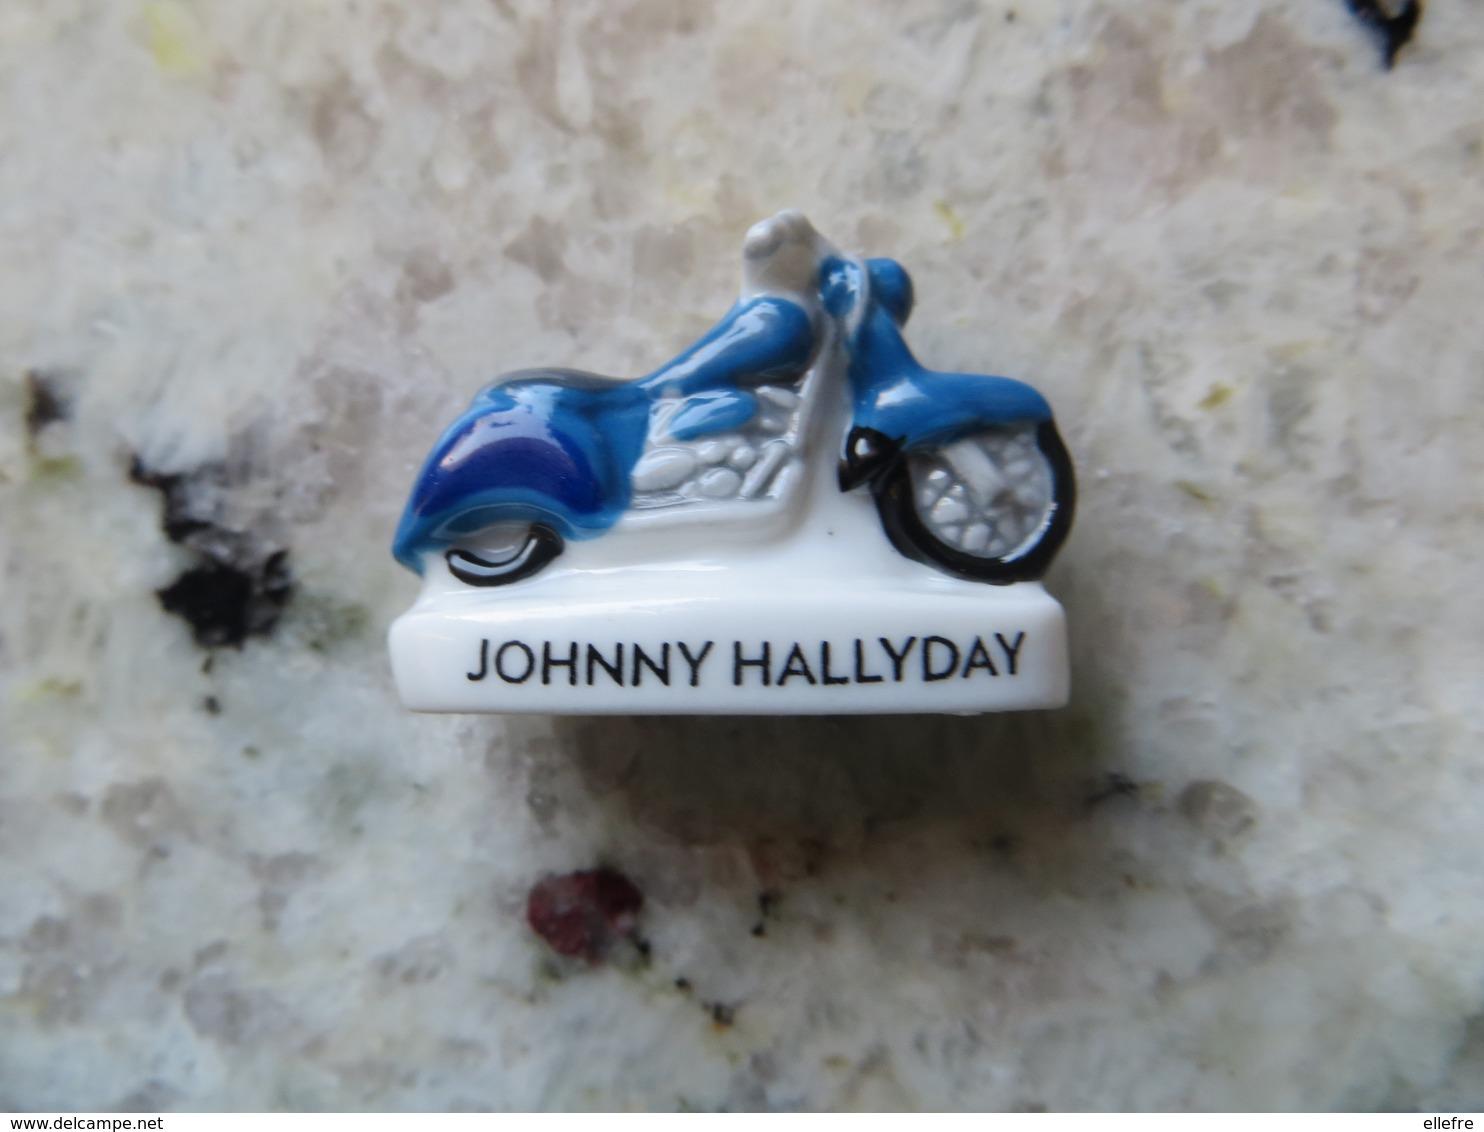 Fève 2019 Série Born Rocker Musicinc - Johnny Hallyday La Moto Harley Davidson - Personaggi